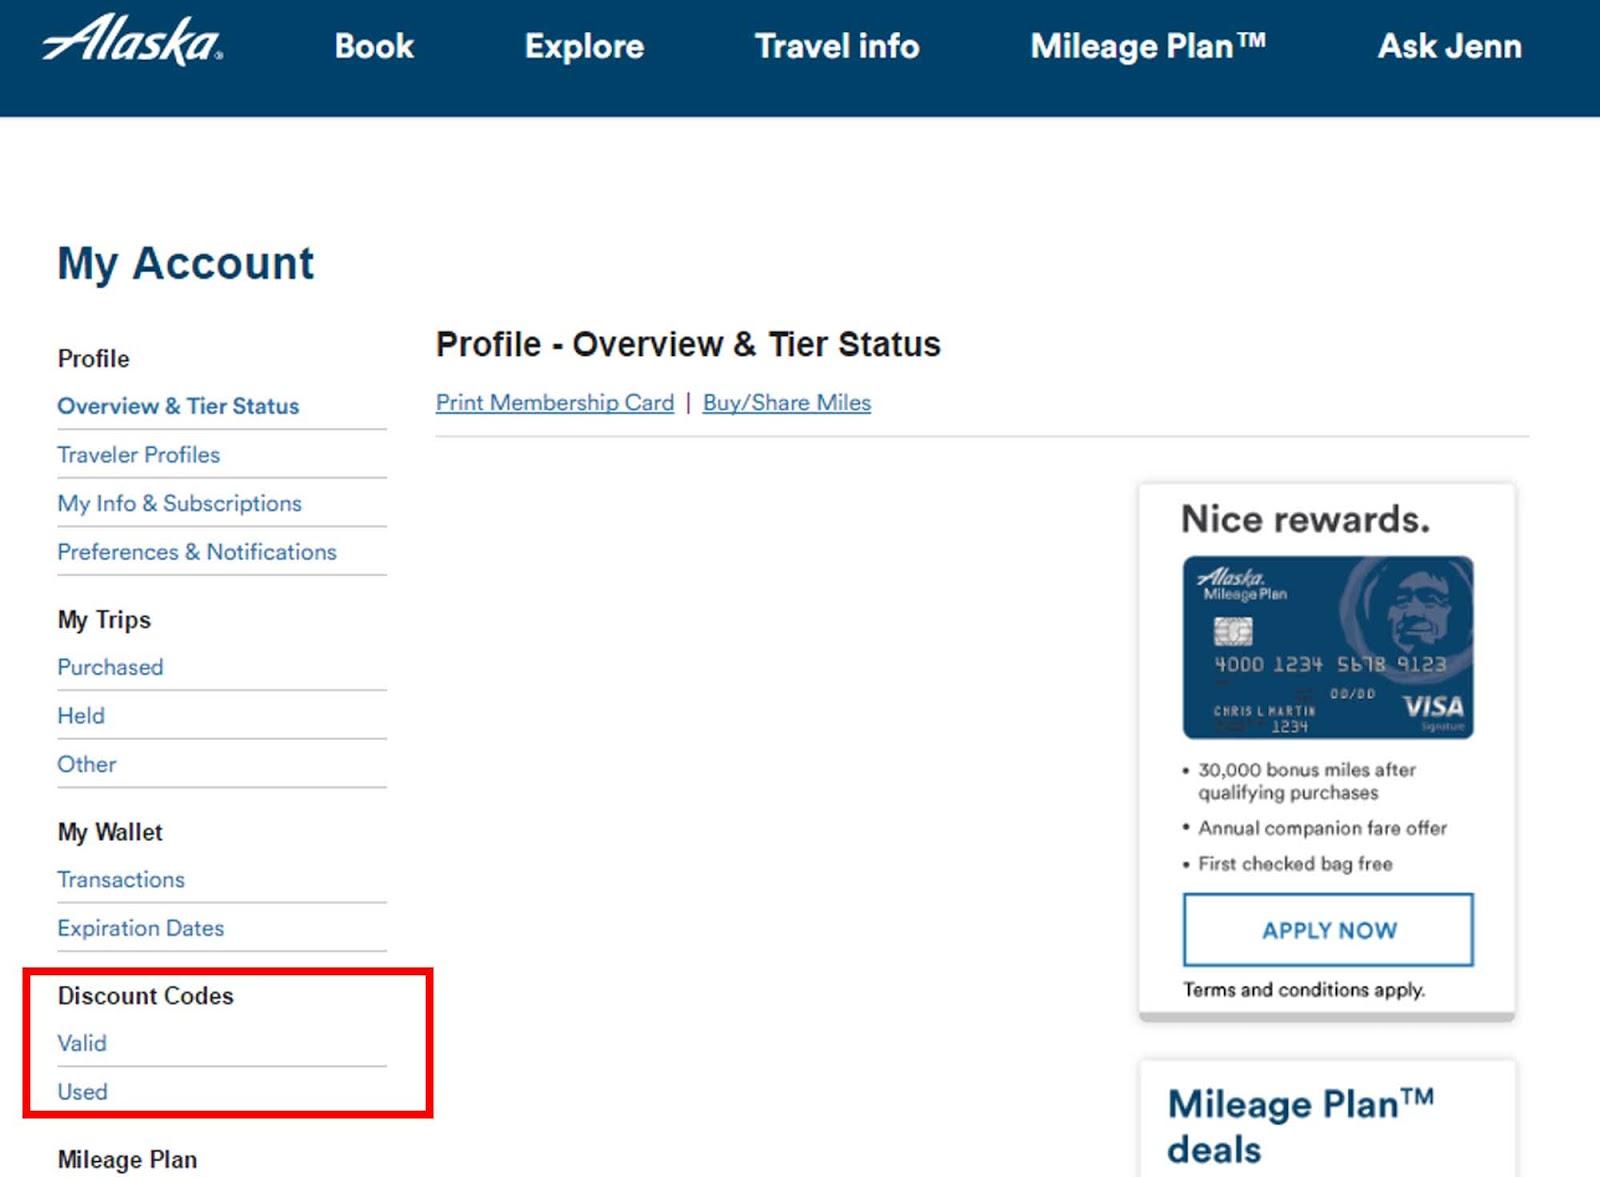 alaska airlines checked bag fee